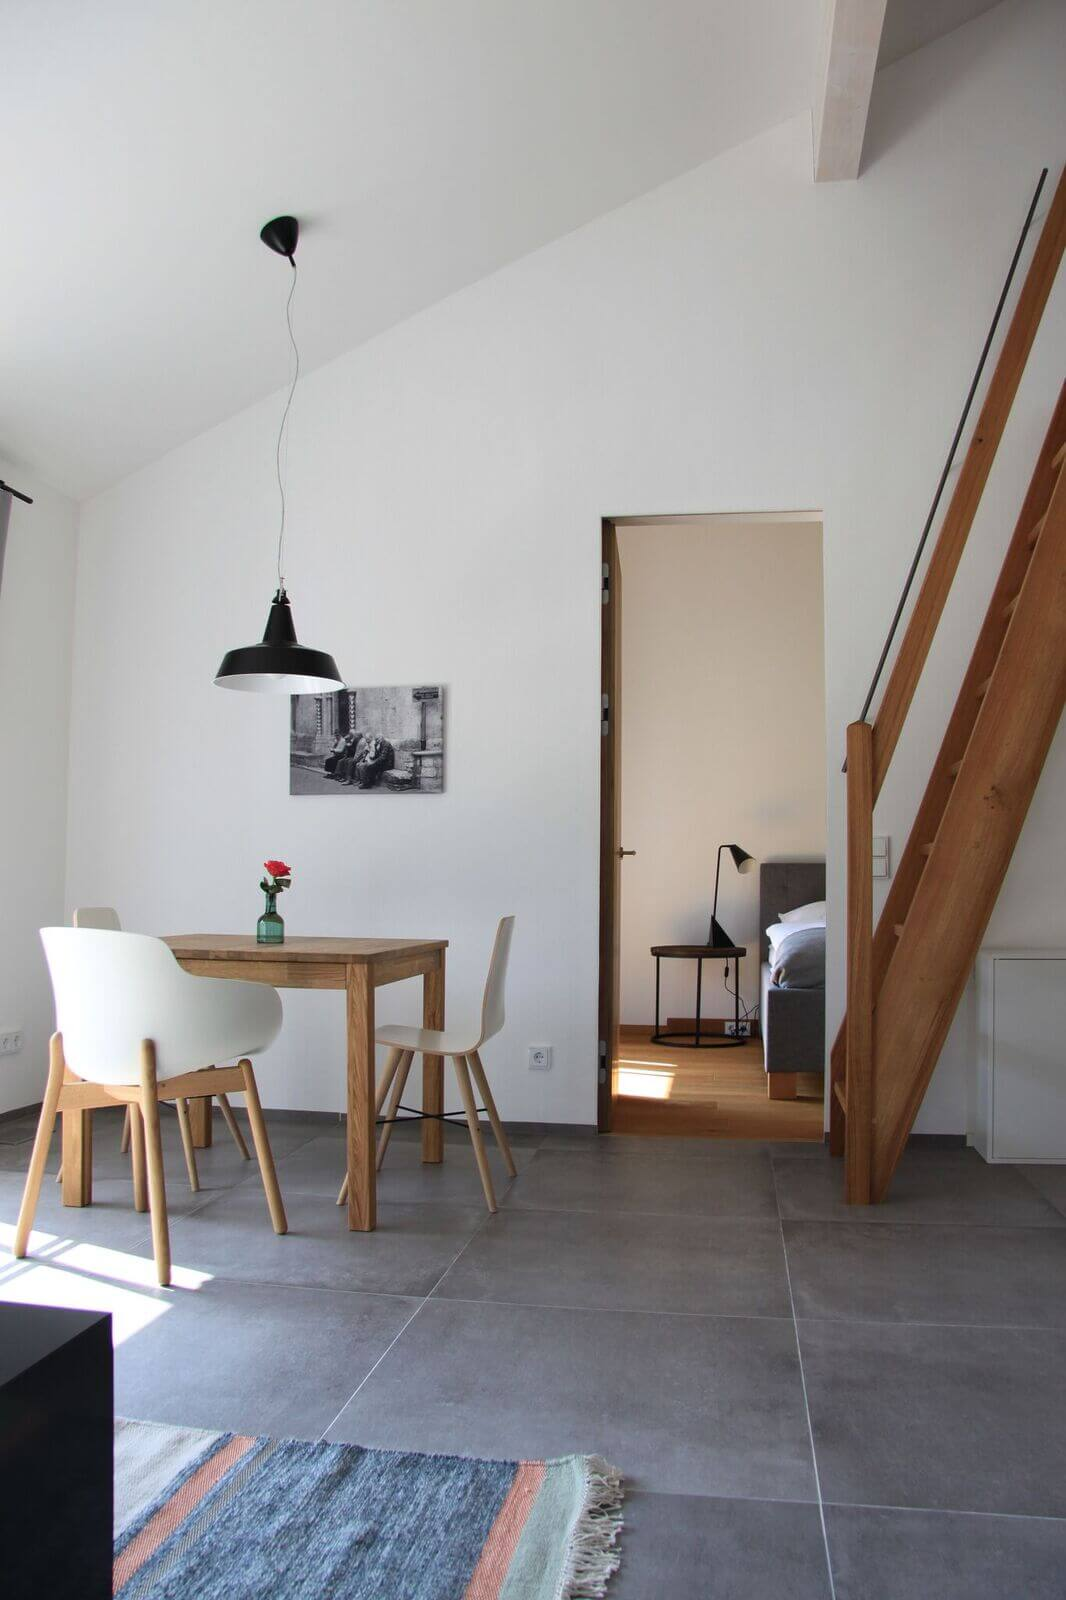 wohnung kampen ferien in aschau. Black Bedroom Furniture Sets. Home Design Ideas